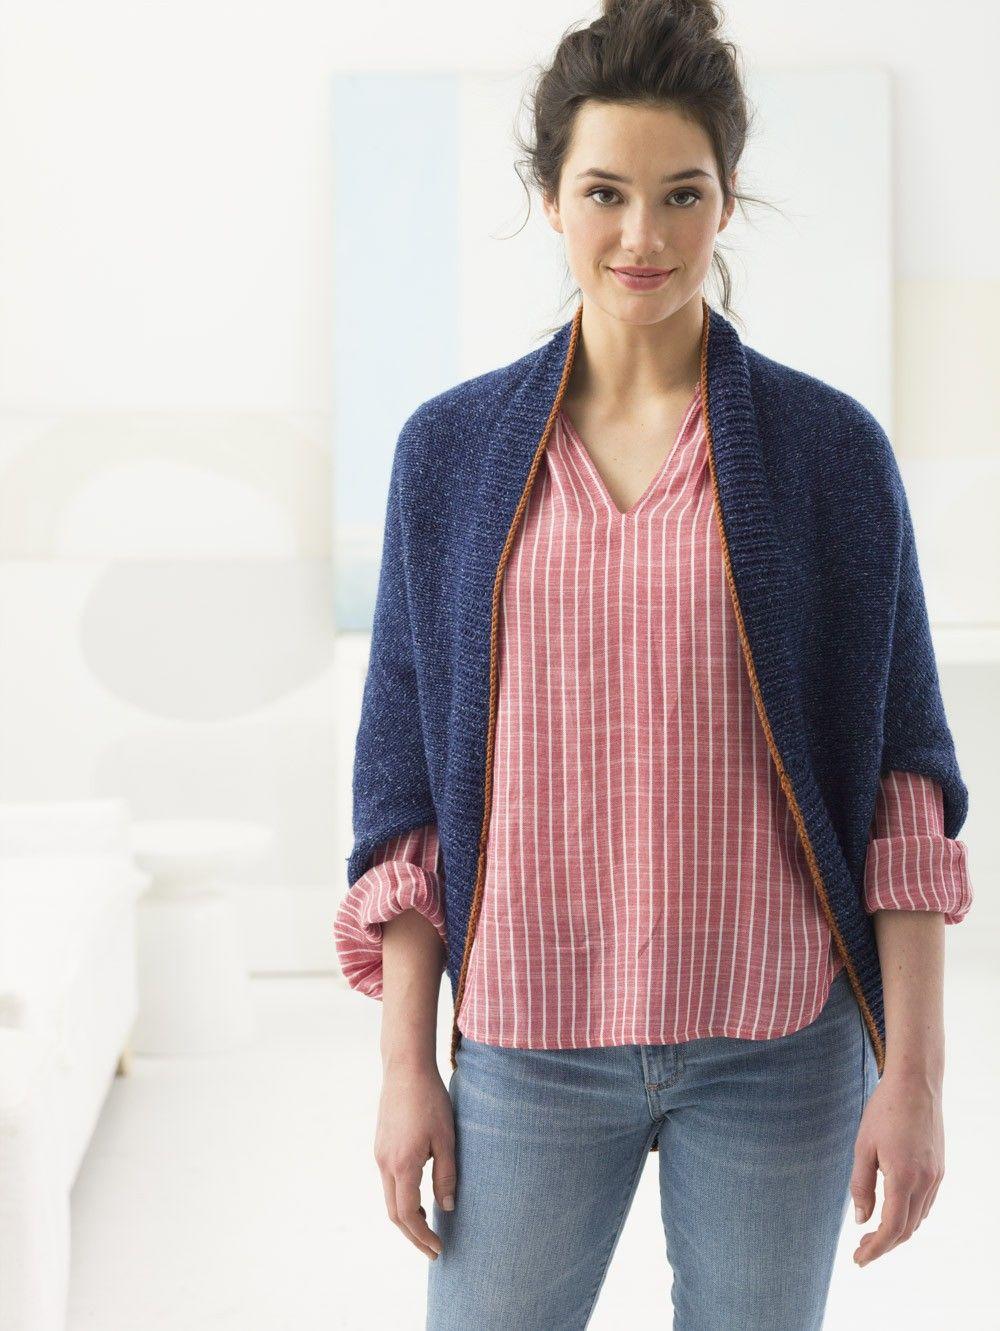 Everyday Shrug (Knit) | Stitches | Pinterest | Tejidos de punto ...